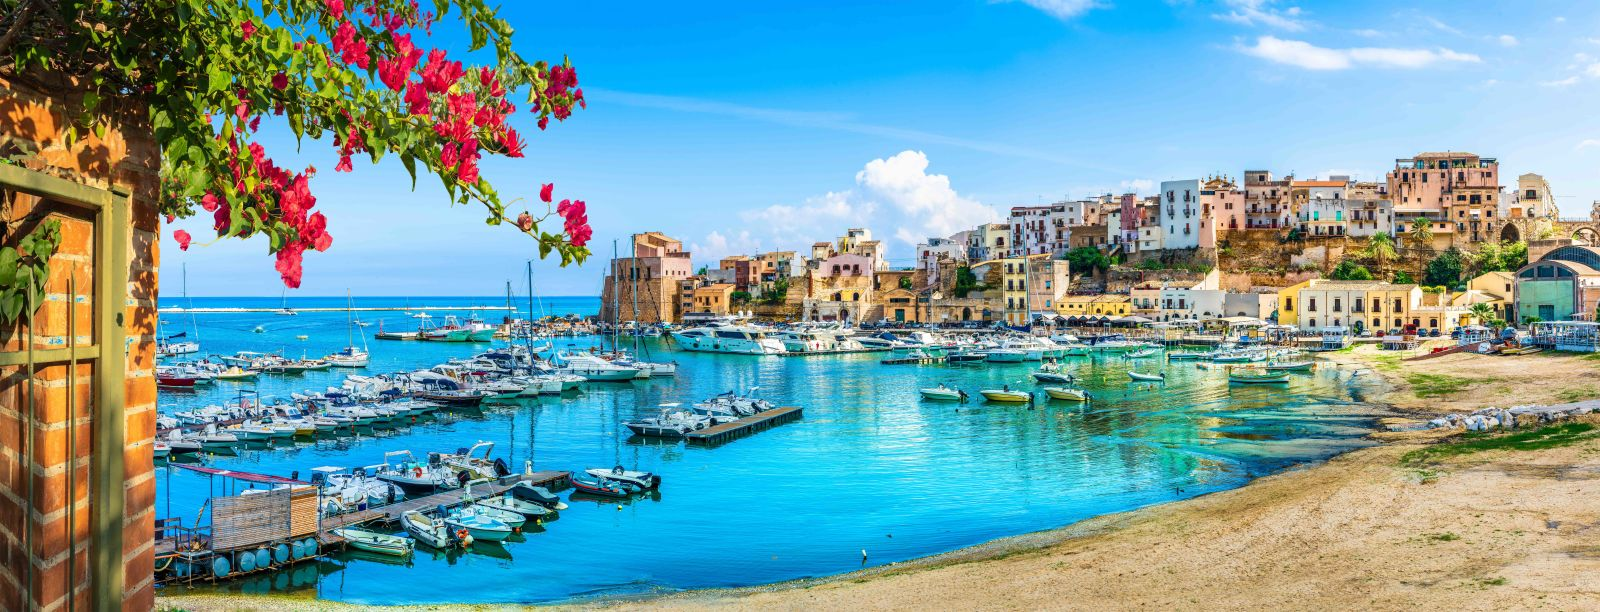 Palermo Sizilien Häuser Boote Meer Stadt